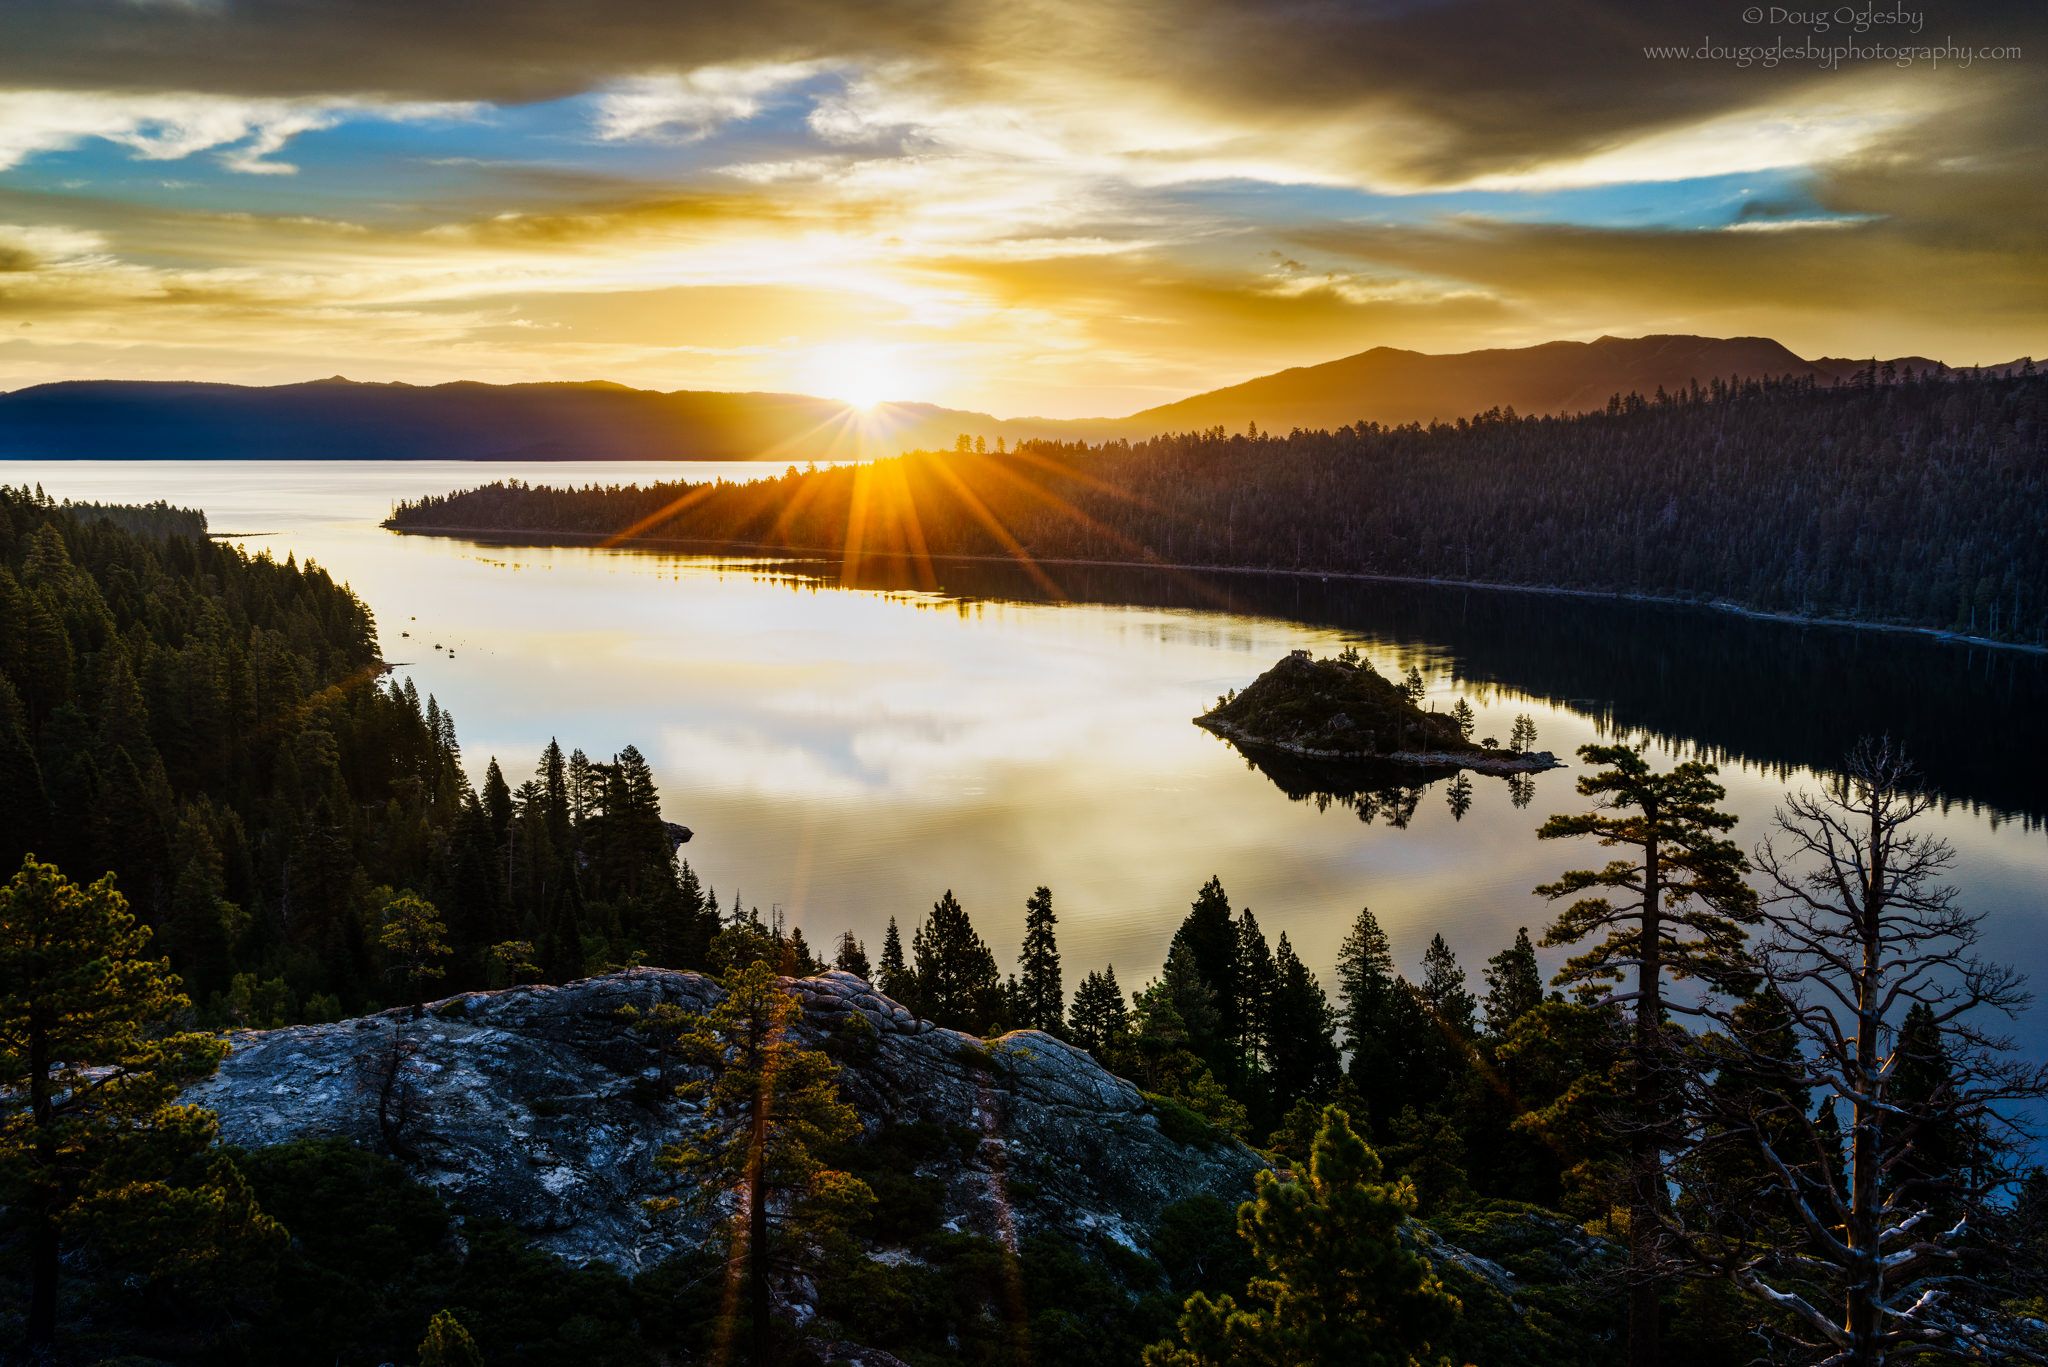 © Sunburst Emerald Bay. Lake Tahoe. Photograph by Doug Oglesby.photo@dougoglesby.com. A PHOTOGRAPHY WORLD Article, Beautiful Lake Tahoe, @ photographyworld.org